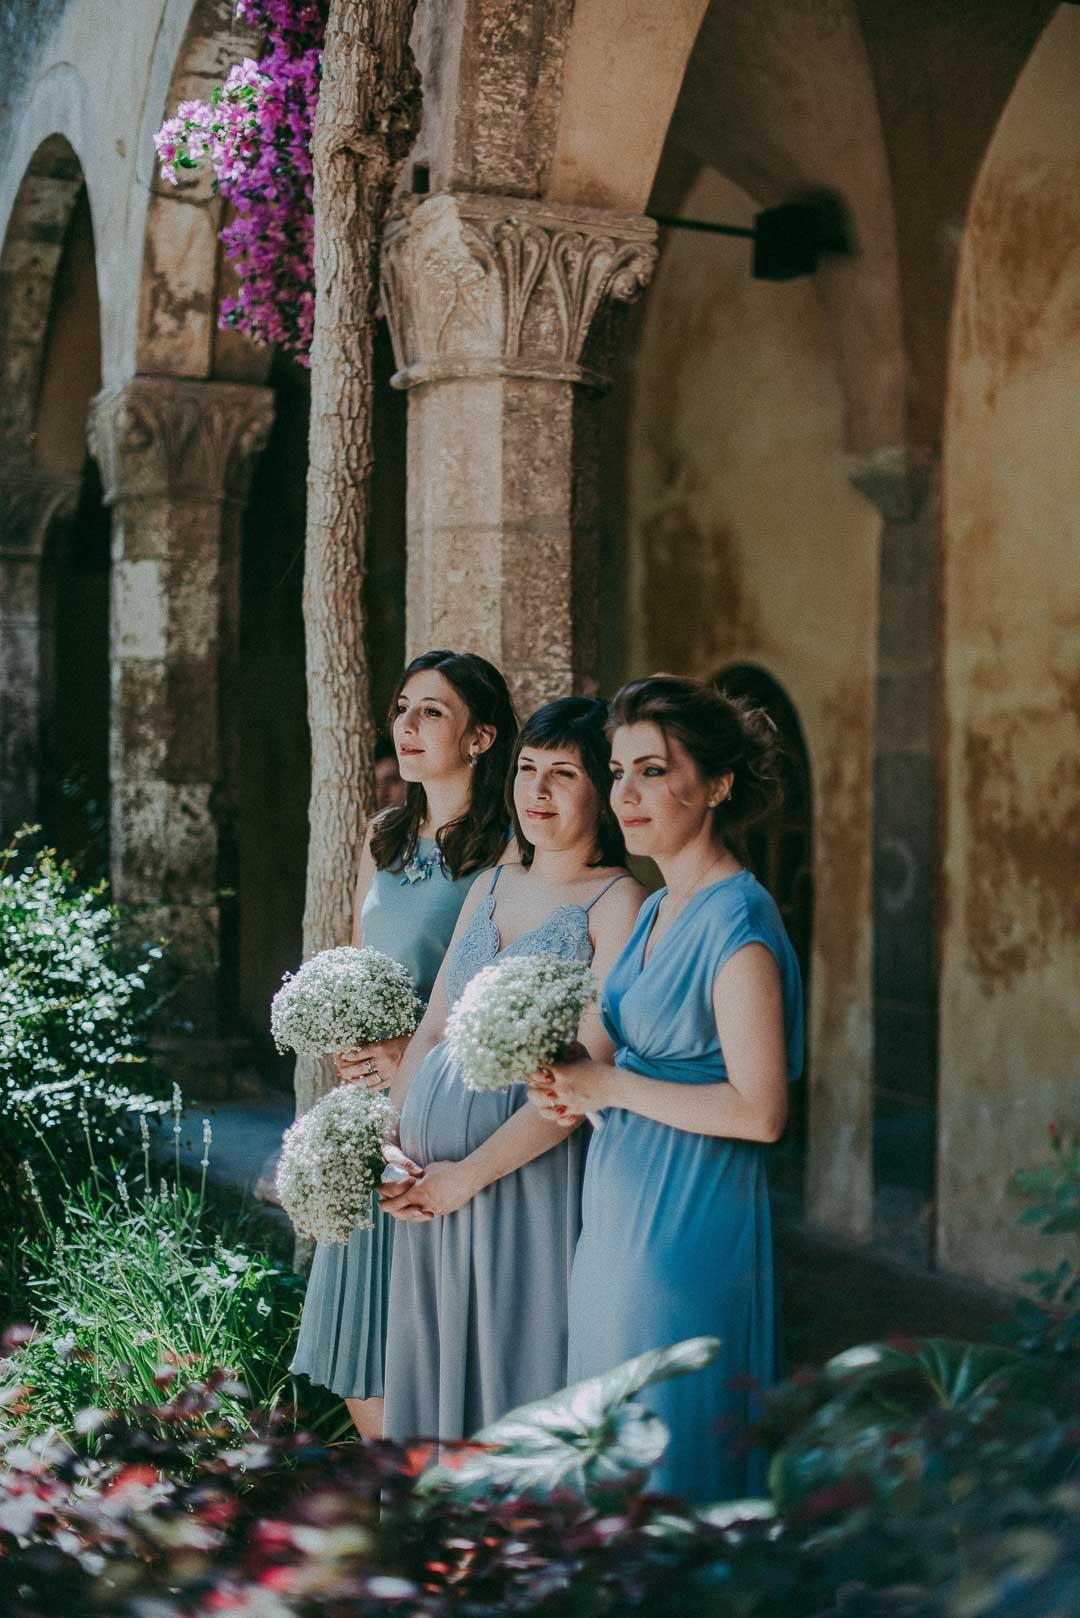 wedding-photographer-destination-fineart-bespoke-reportage-sorrento-parcodeiprincipi-vivianeizzo-spazio46-40